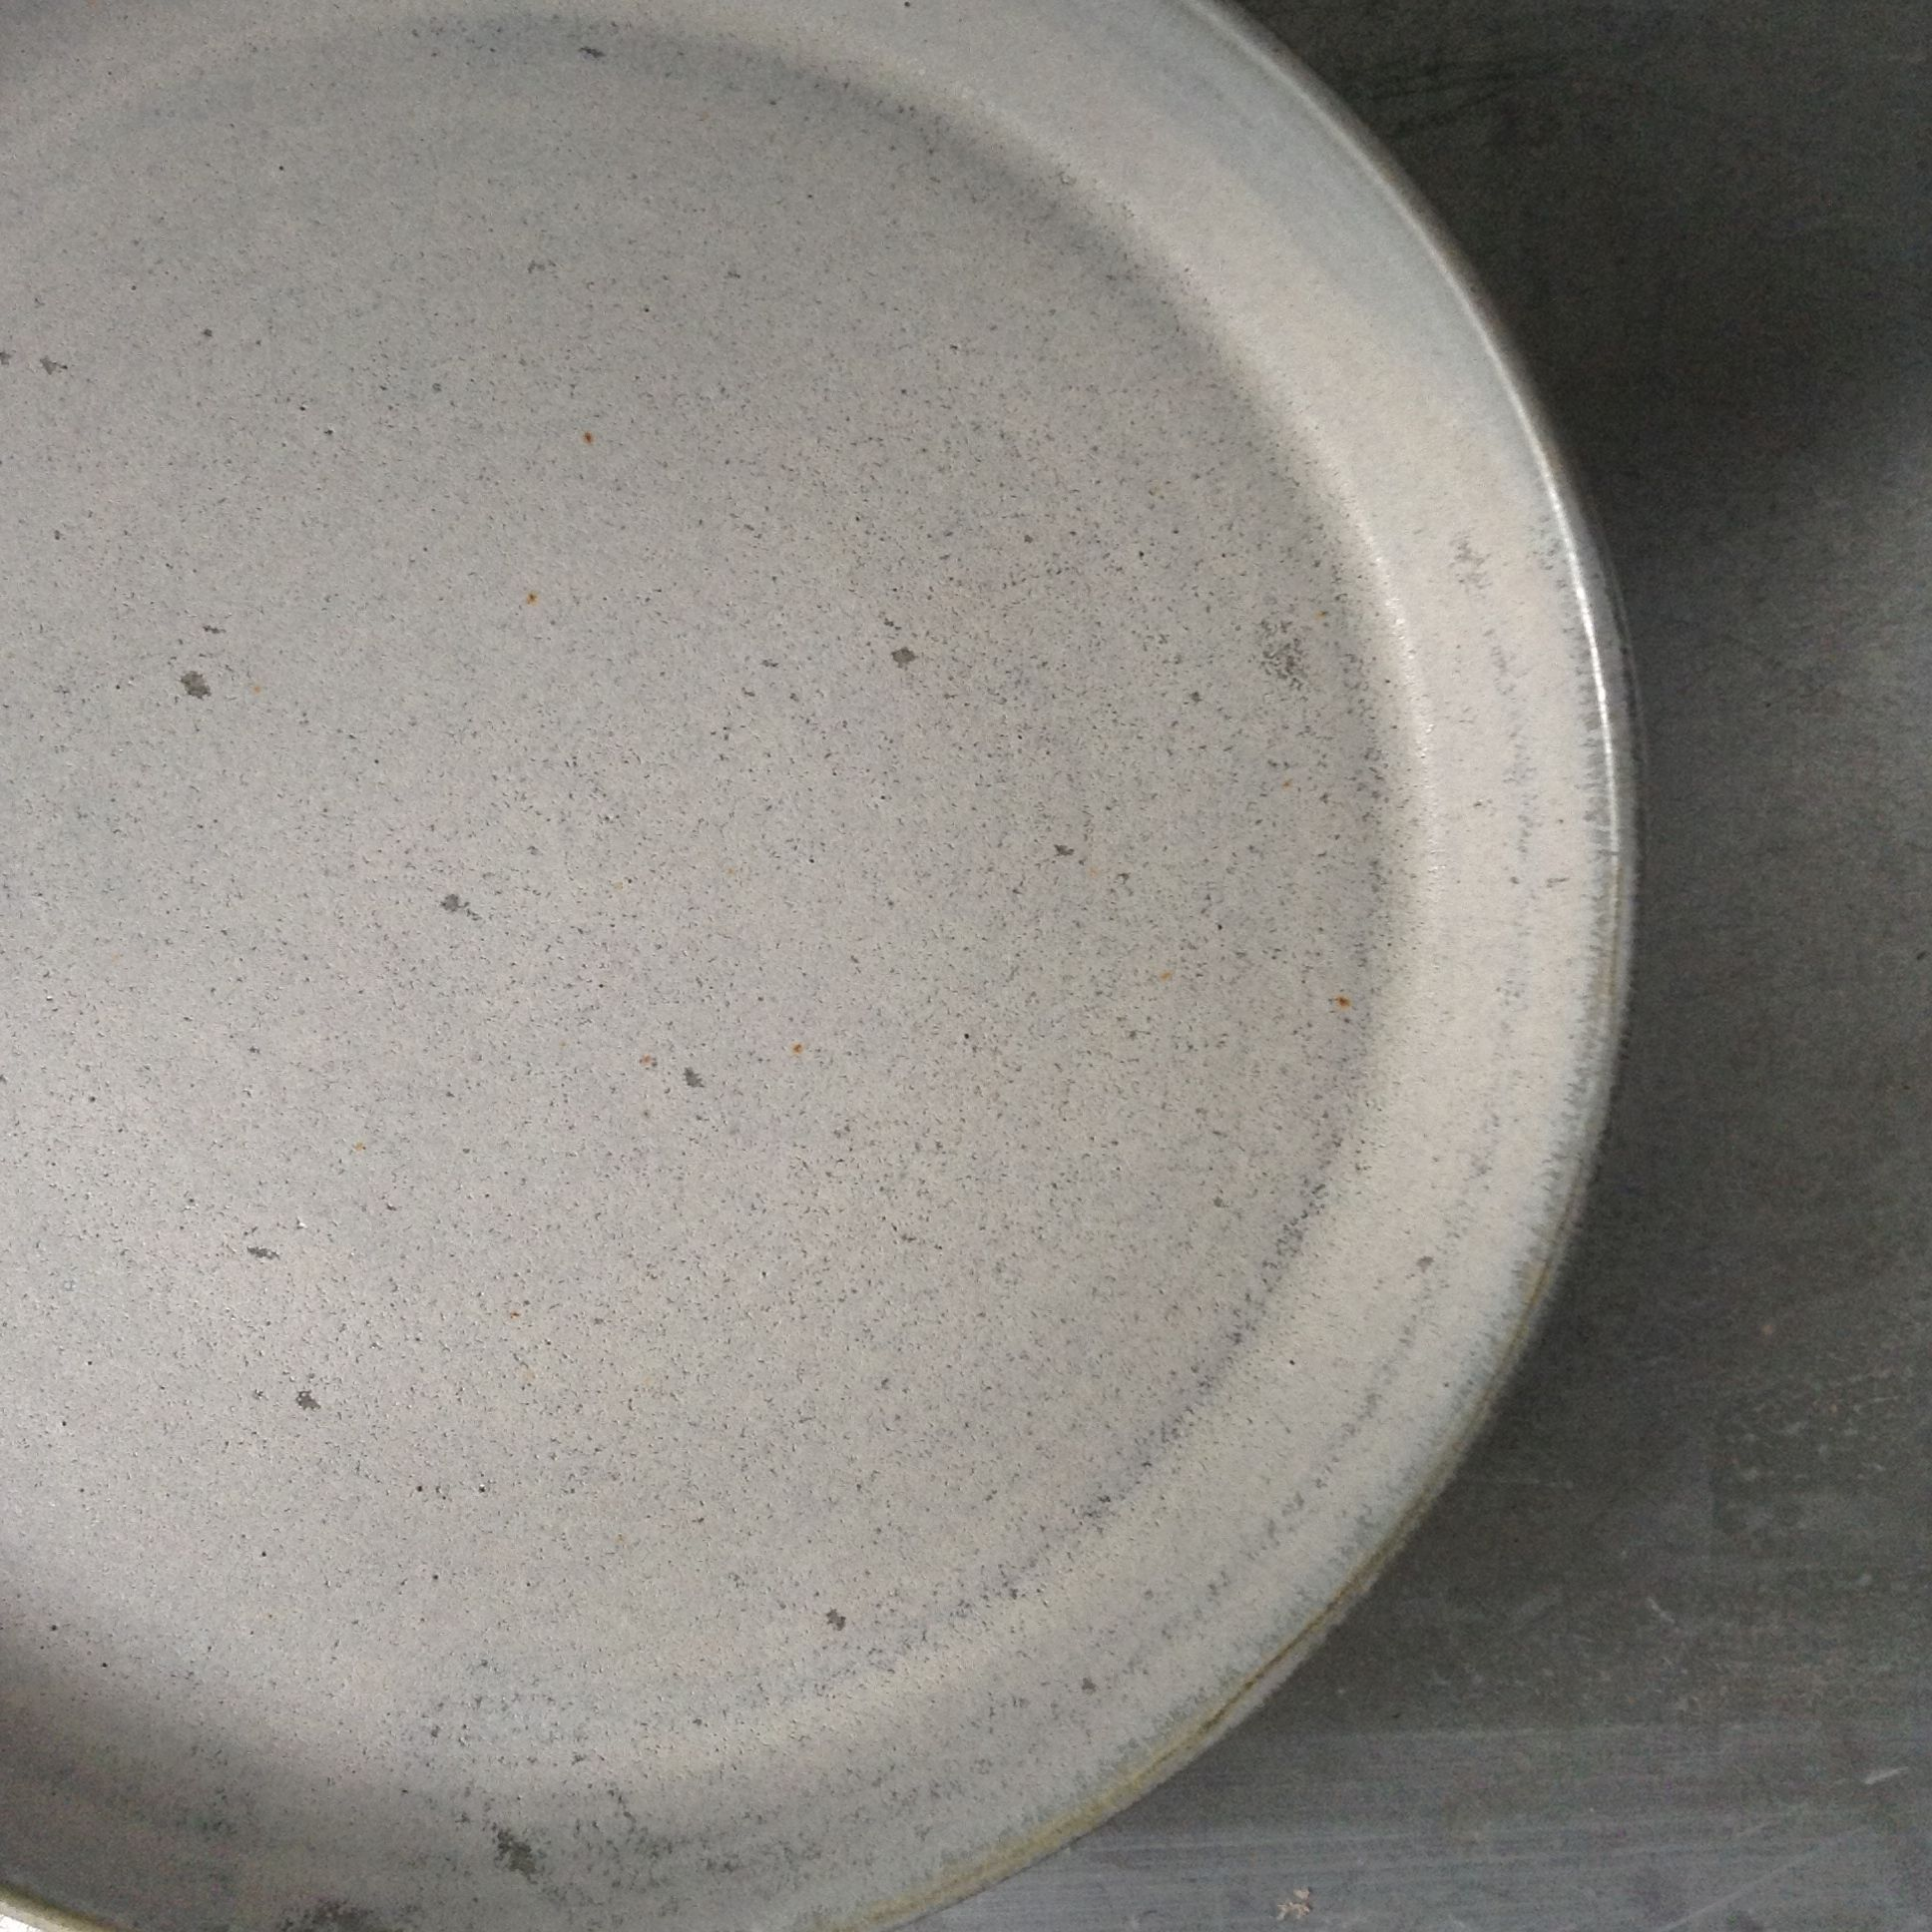 Stone Dinner Plate Speck+Stone stoneware speckandstone.com & Stone Dinner Plate Speck+Stone stoneware speckandstone.com | Speck + ...